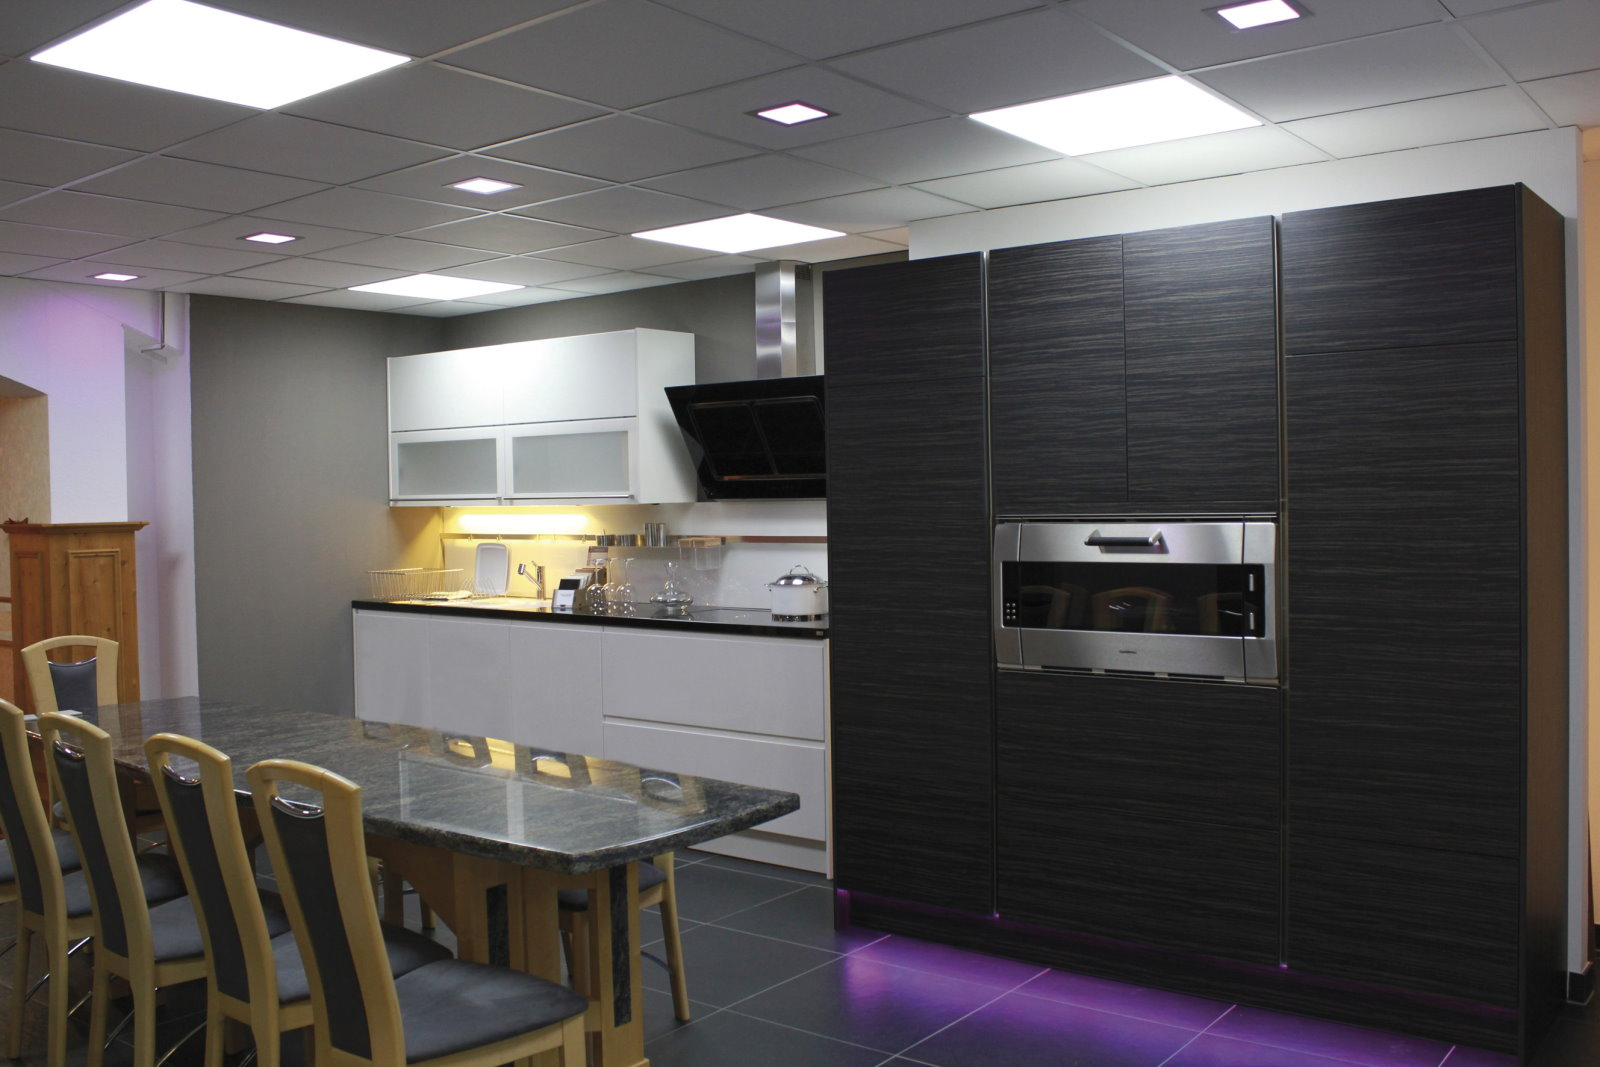 Full Size of Led Panel Deckenleuchte Küche Led Panel Küchenrückwand Led Panel Küche Dimmbar Led Panel Küche Unterbau Küche Led Panel Küche